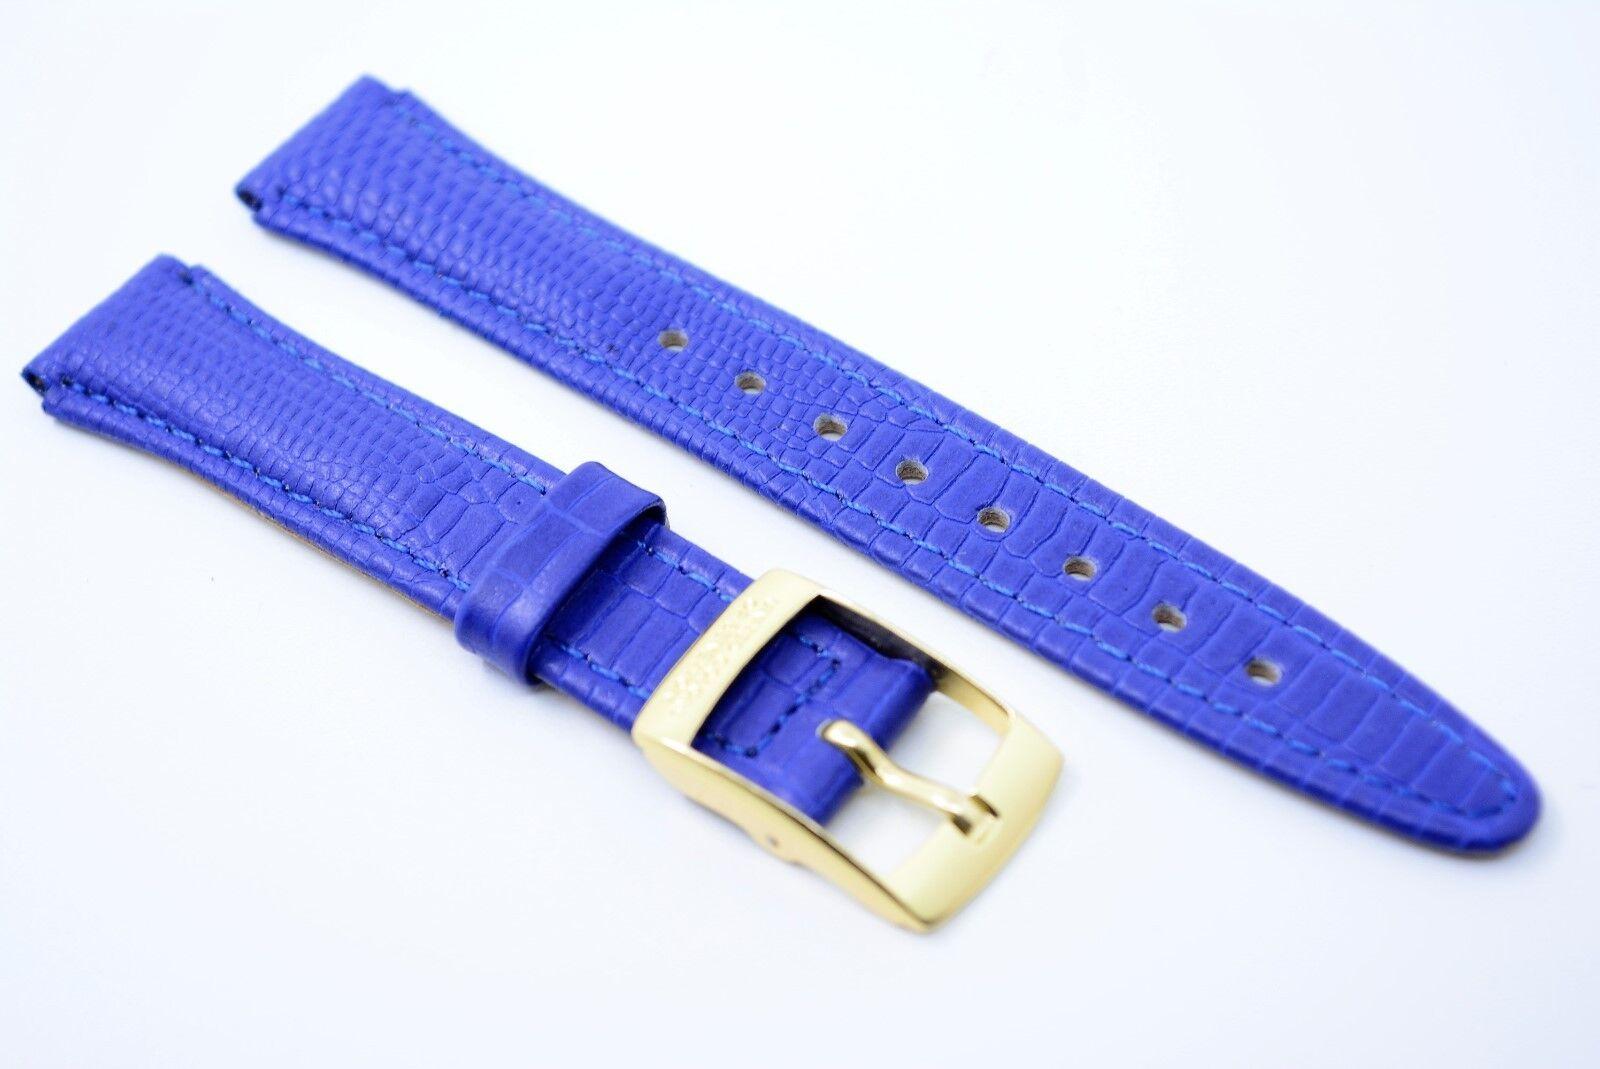 Uhrenarmband Echtleder 14 mm Band UNITED COLORS OF BENETTON Blau Kroko gold